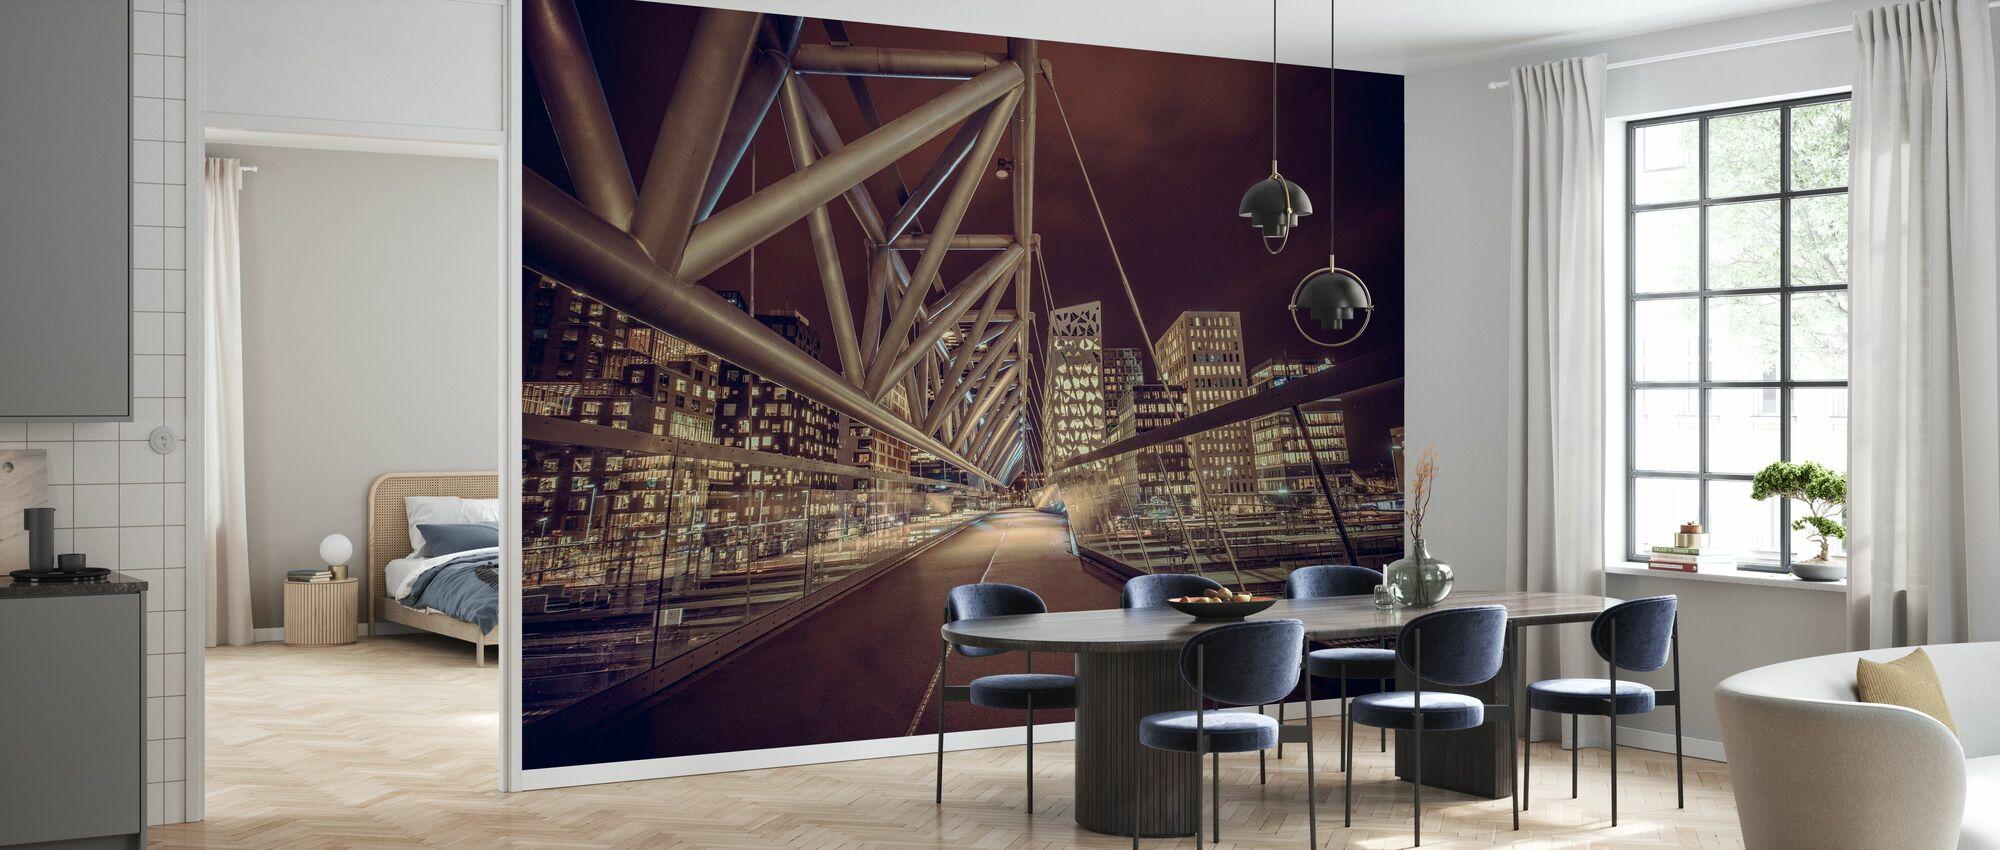 Pedestrian Bridge in Oslo - Wallpaper - Kitchen